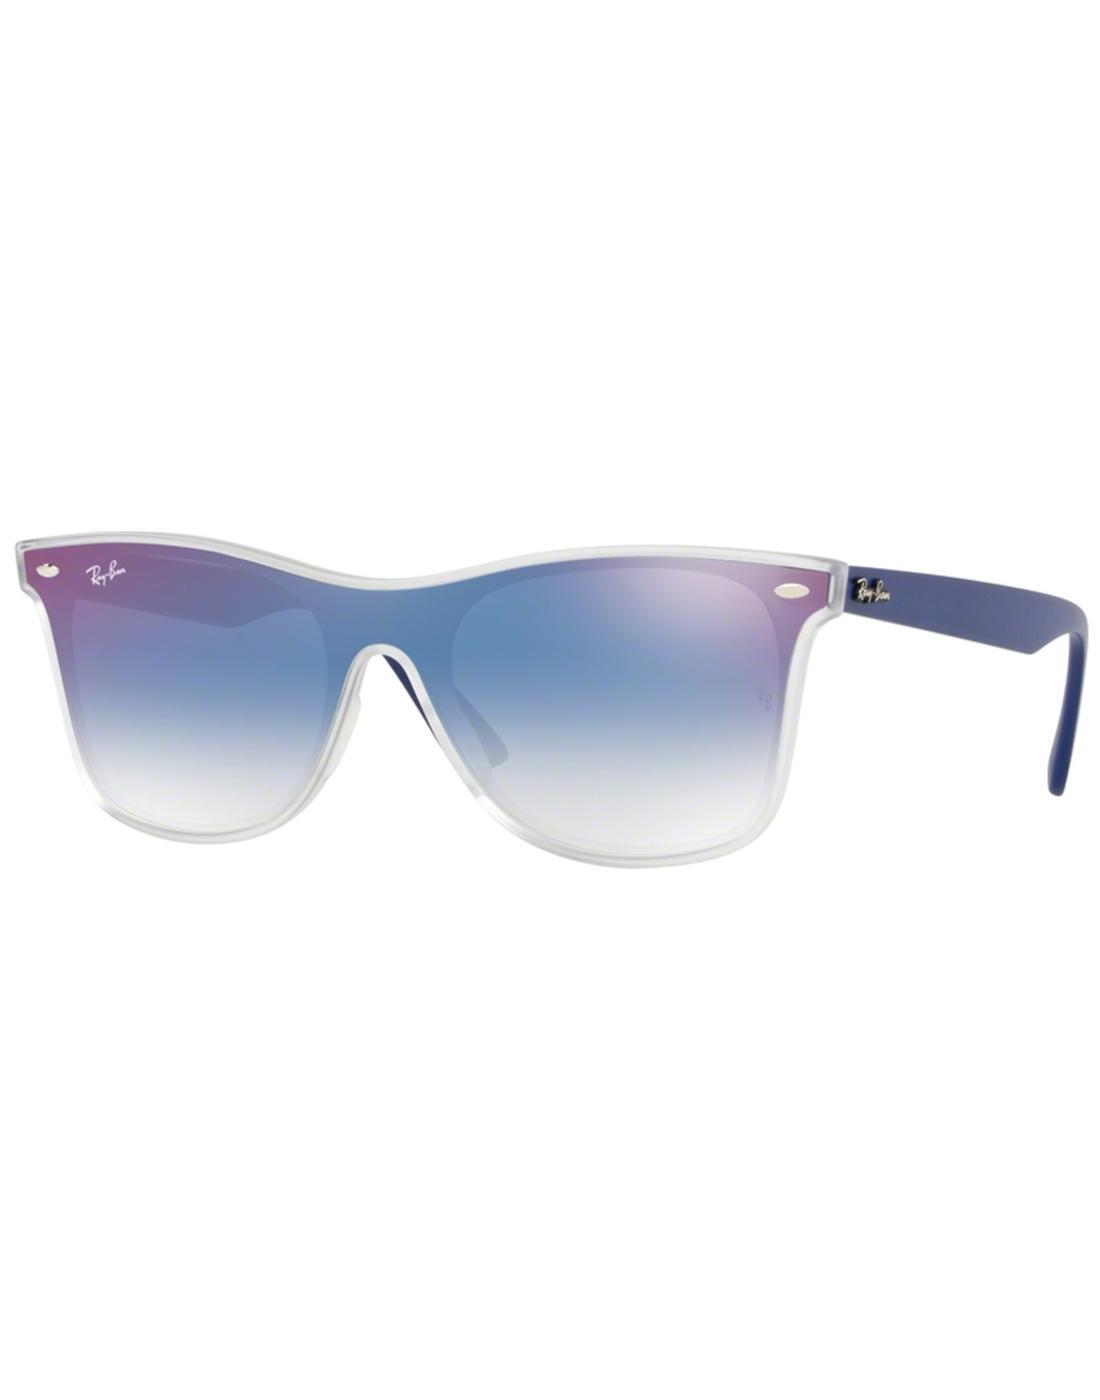 7ff77c7b0564d RAY-BAN Blaze Wayfarer Retro Mirror Lens Sunglasses in Blue